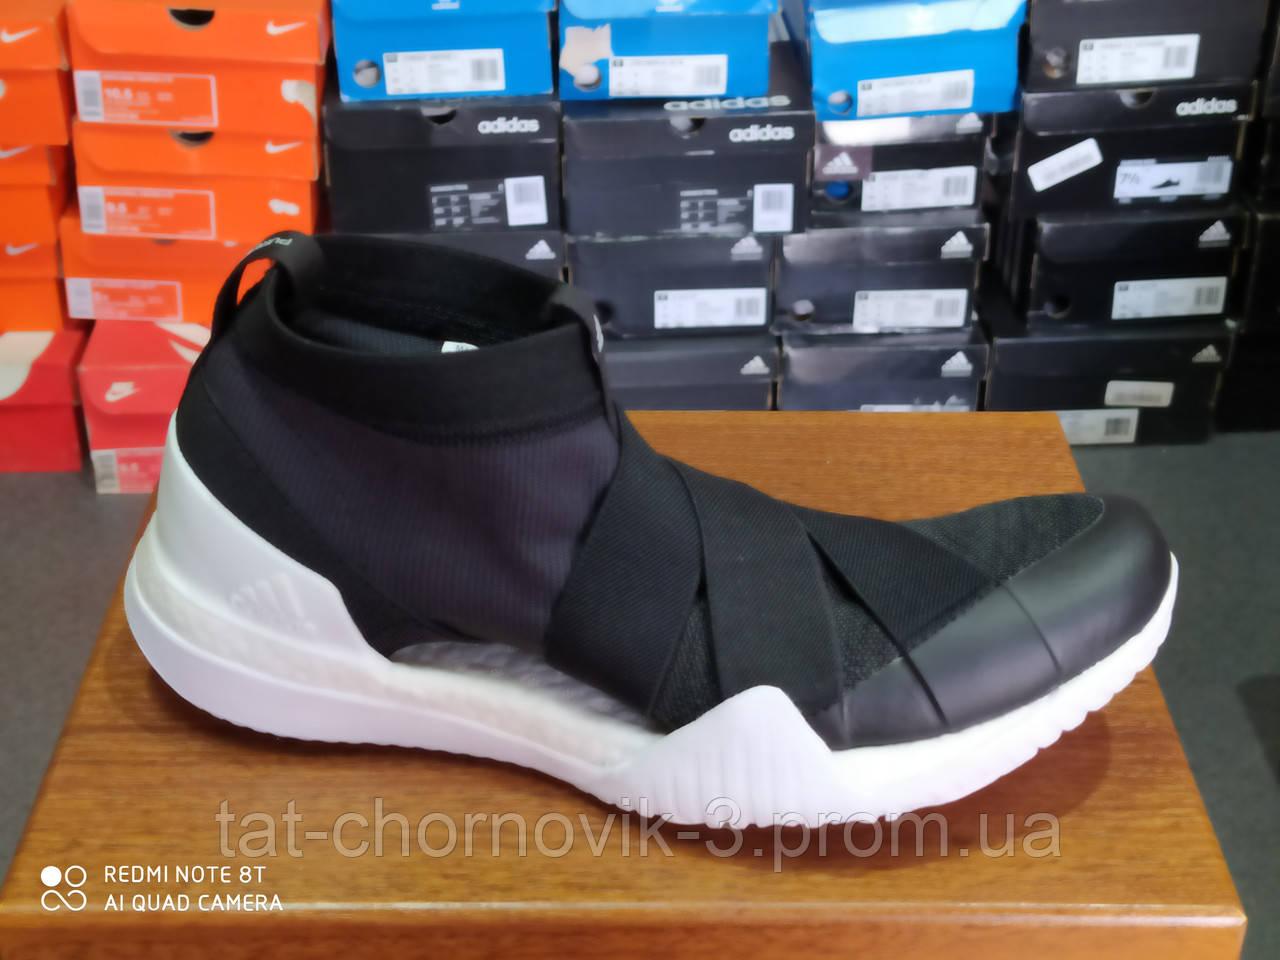 Женские кроссовки adidas Pureboost X TR 3.0 LL (Артикул: CG3524) Оригинал